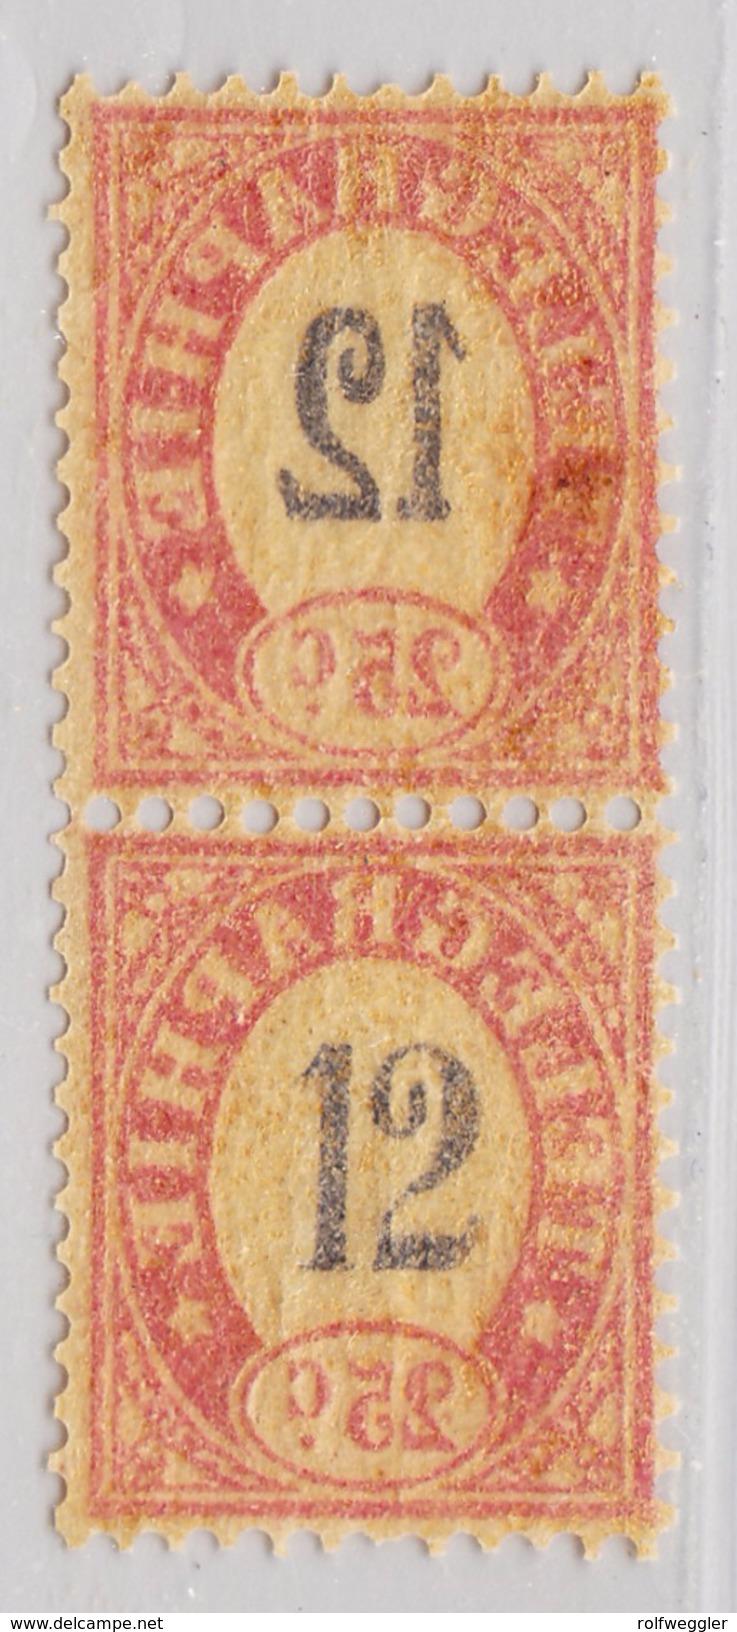 Schweiz Telegraphen-Marke 1868 Probedruck 25c Senkrechtes Paar Auf Seidenpapier - Télégraphe